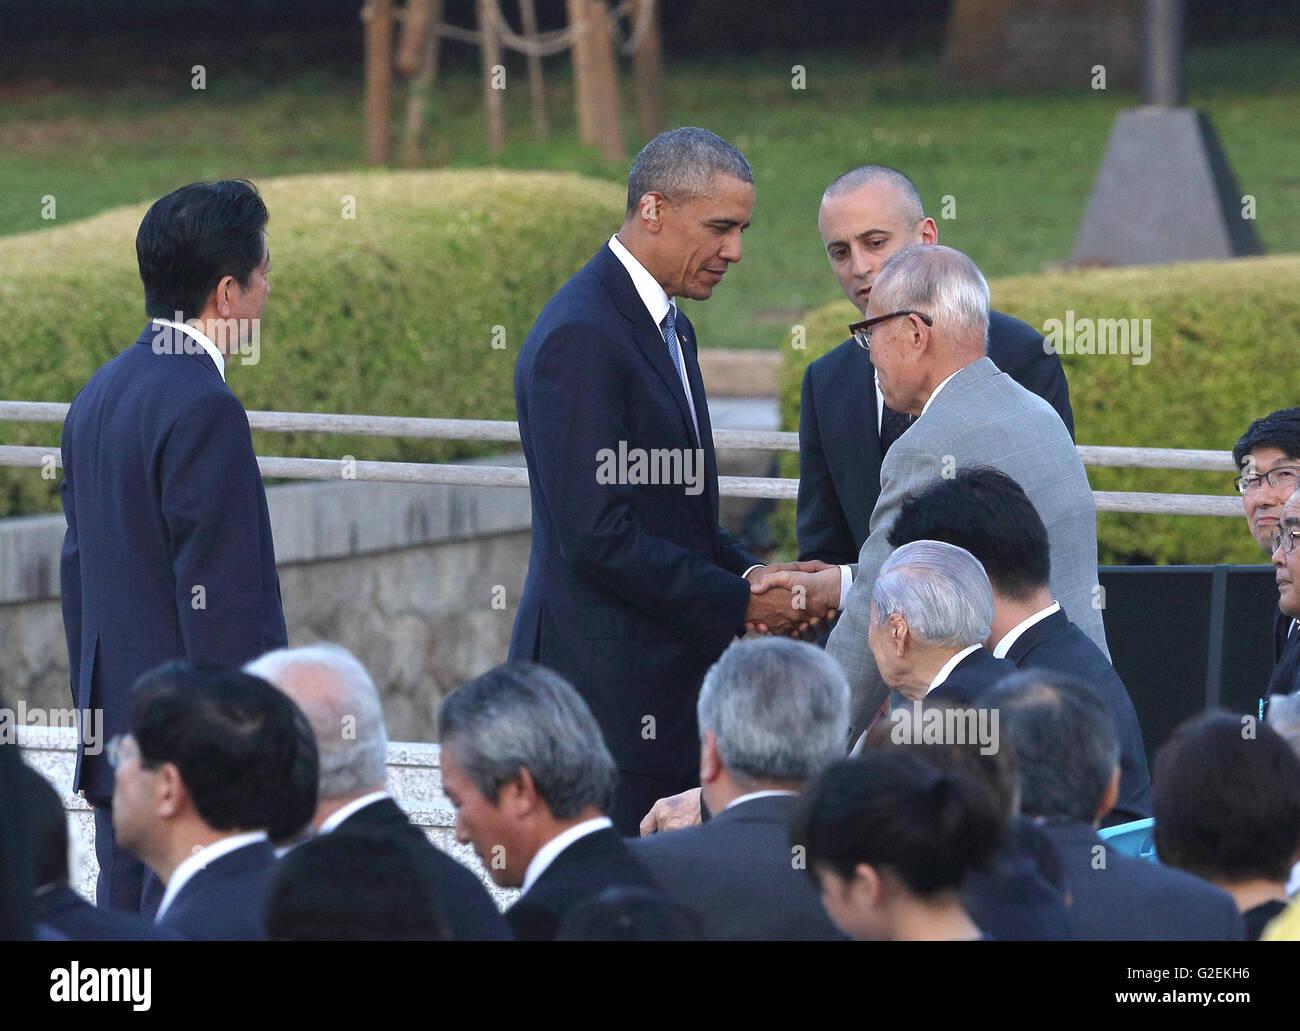 U.S. president Barack Obama talks with an atomic bomb survivor Shigeaki Mori at Hiroshima Peace Memorial Park in Hiroshima, Japan on May 27, 2016. © Motoo Naka/AFLO/Alamy Live News Stock Photo